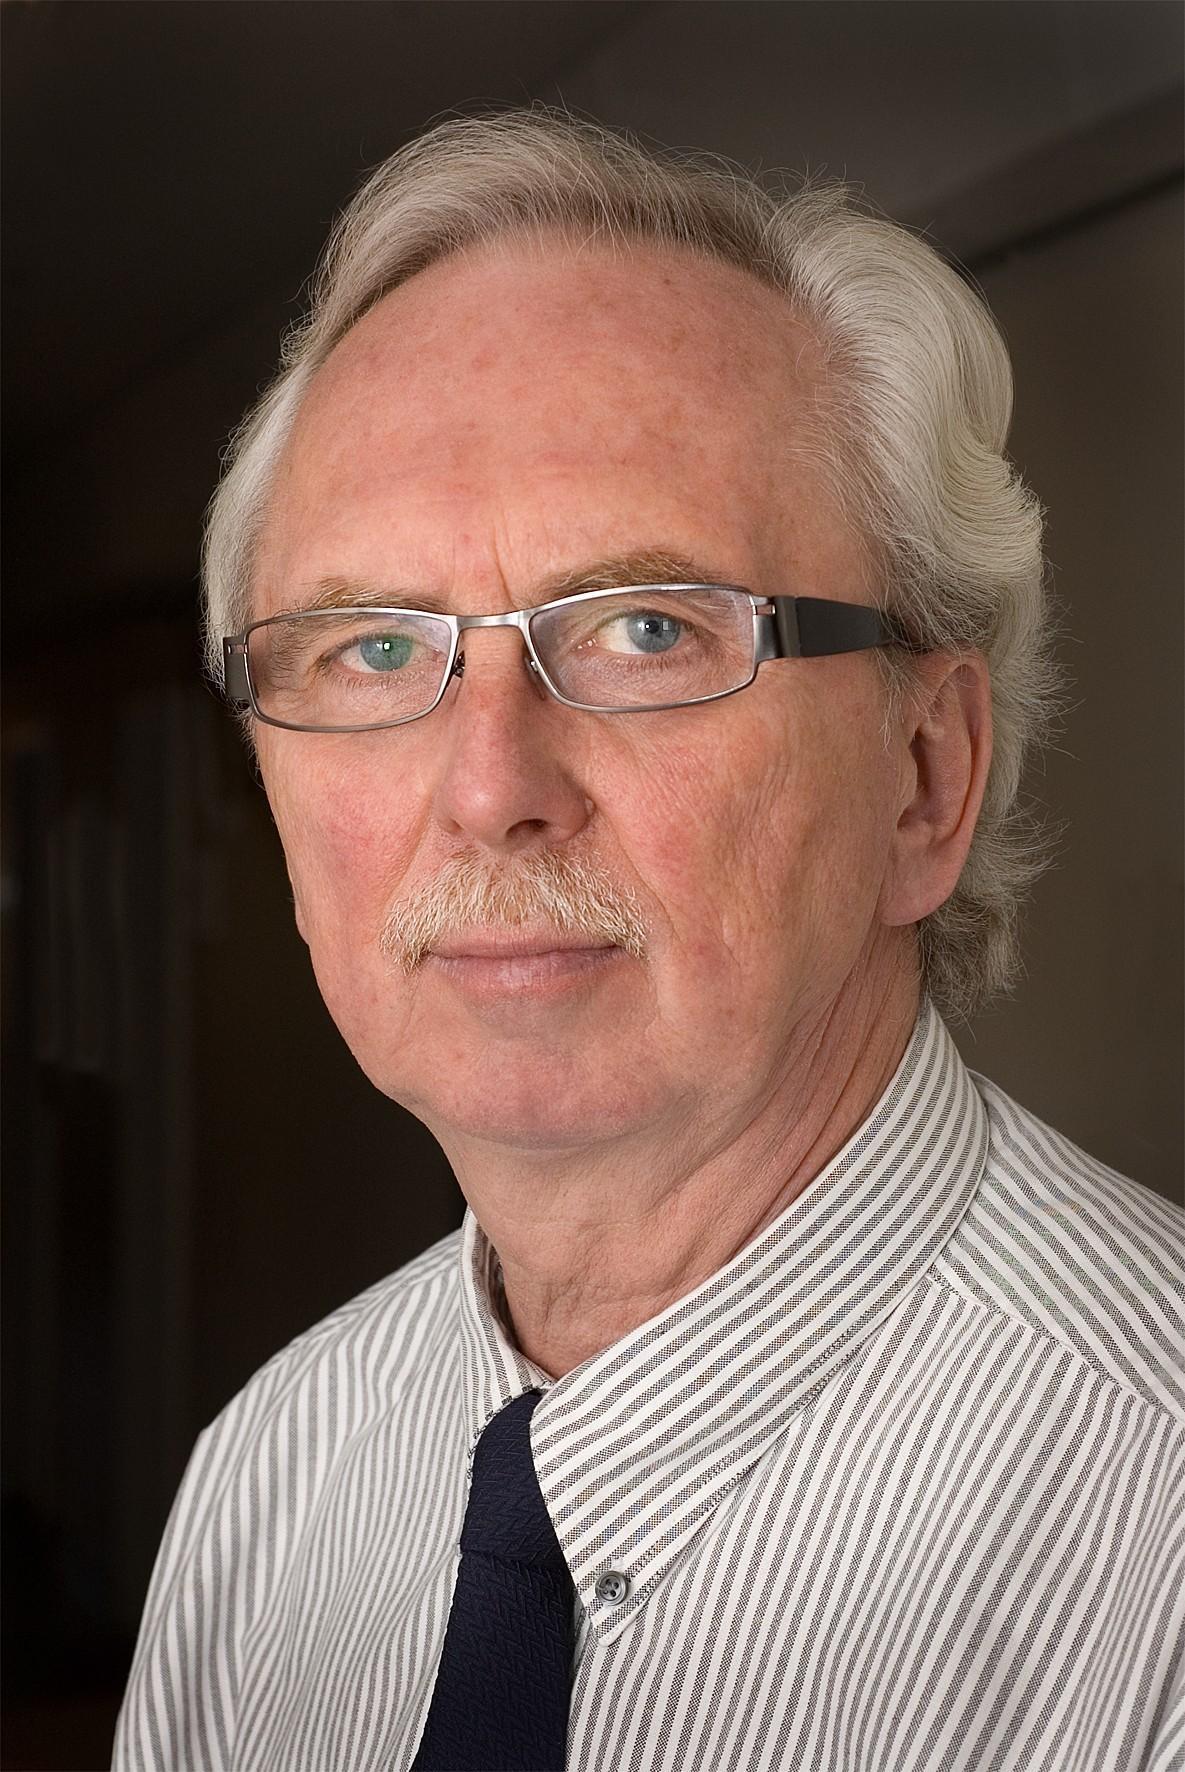 Tysk diabetespris til dansk professor